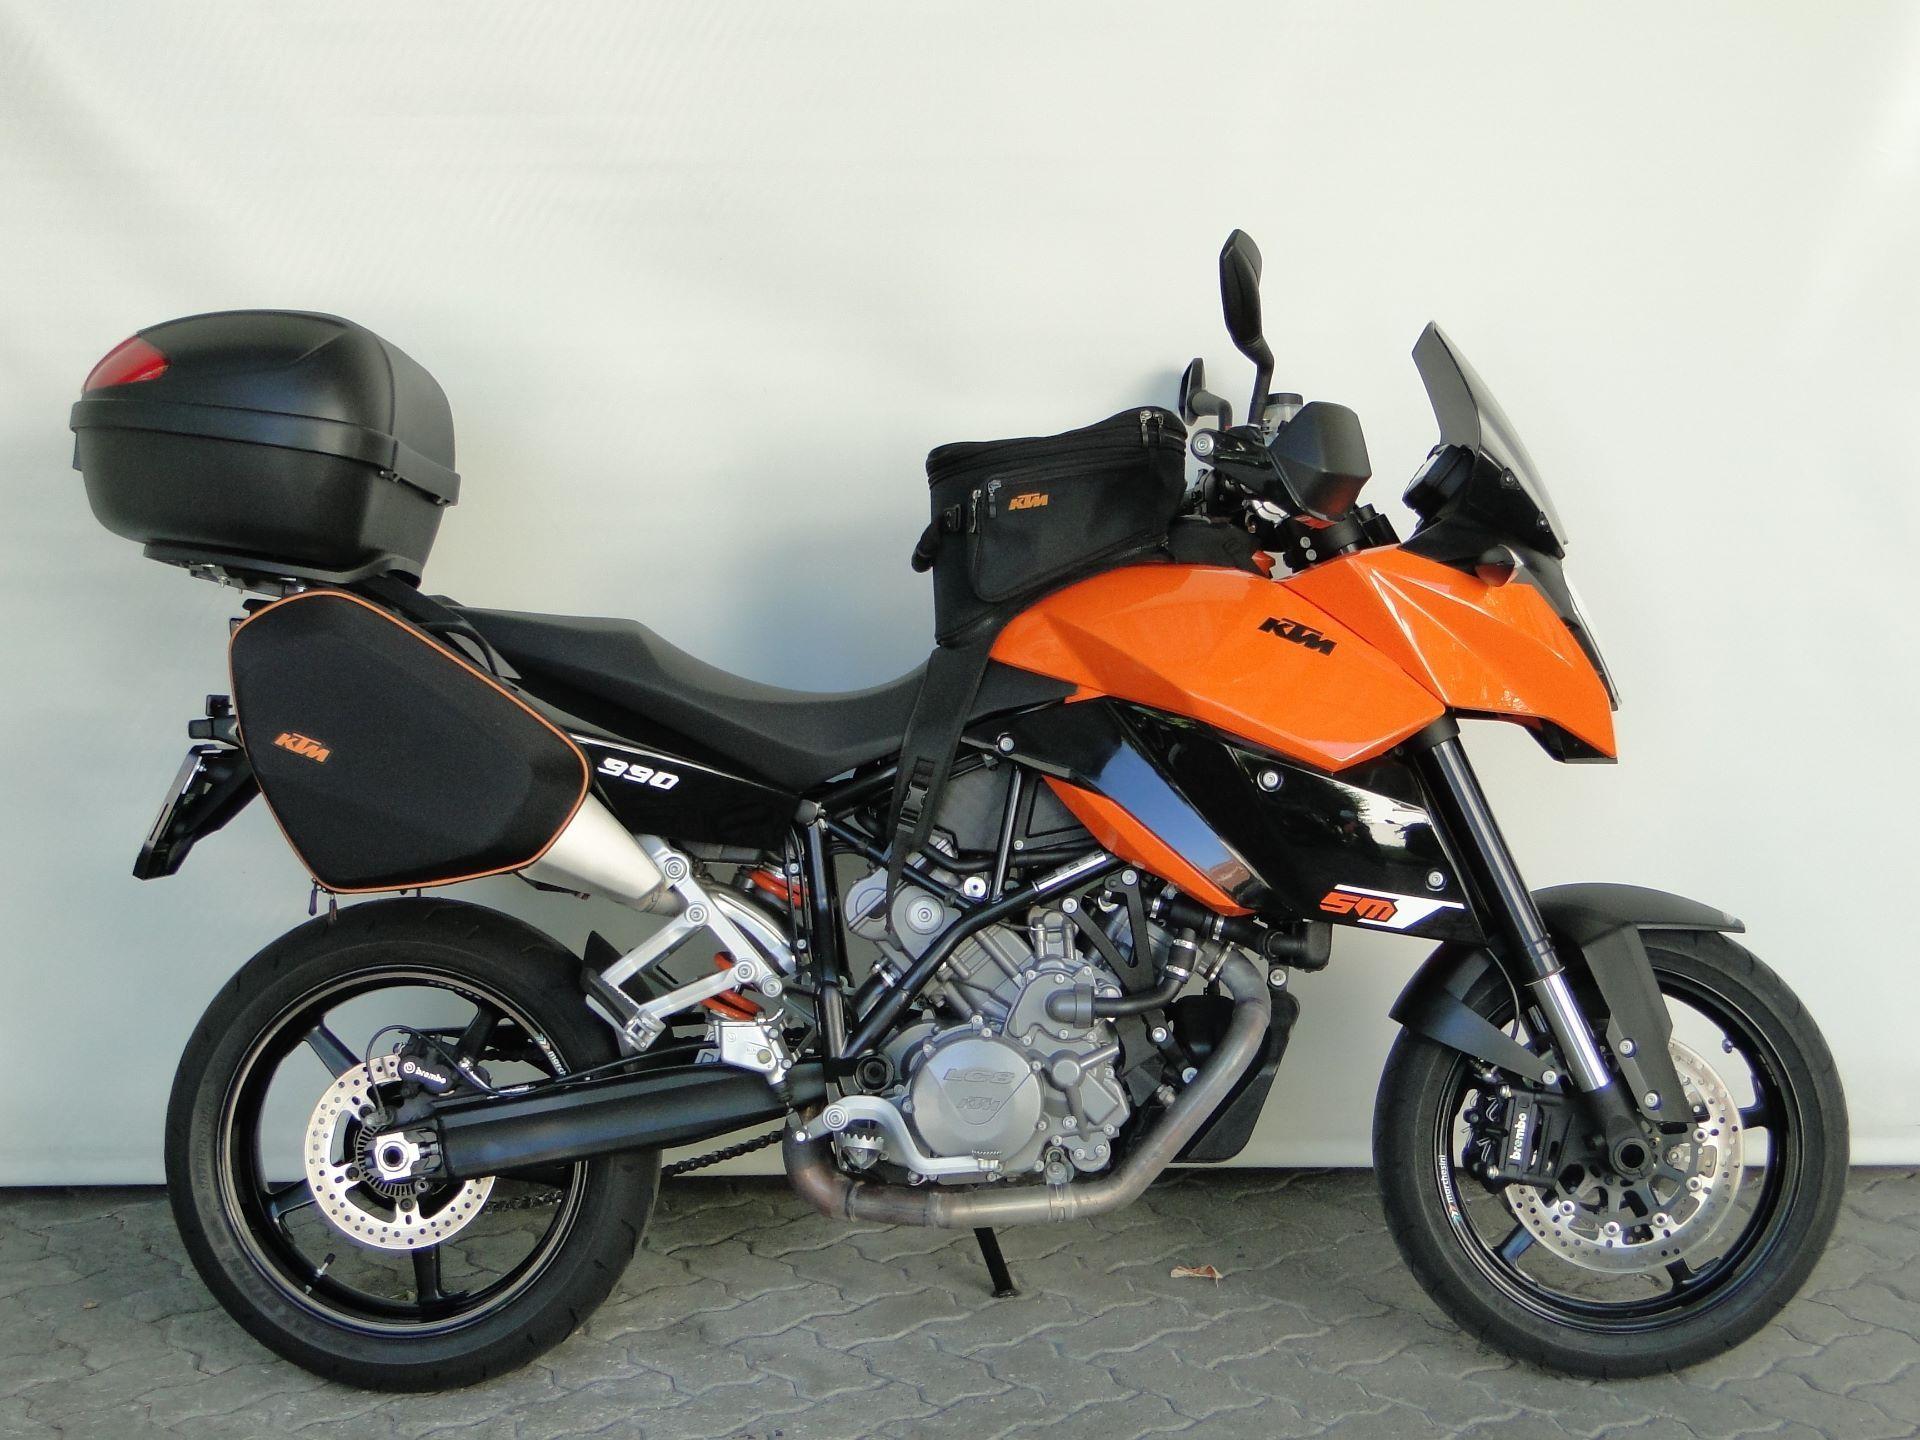 moto occasions acheter ktm 990 supermoto t hobi moto ag winterthur. Black Bedroom Furniture Sets. Home Design Ideas